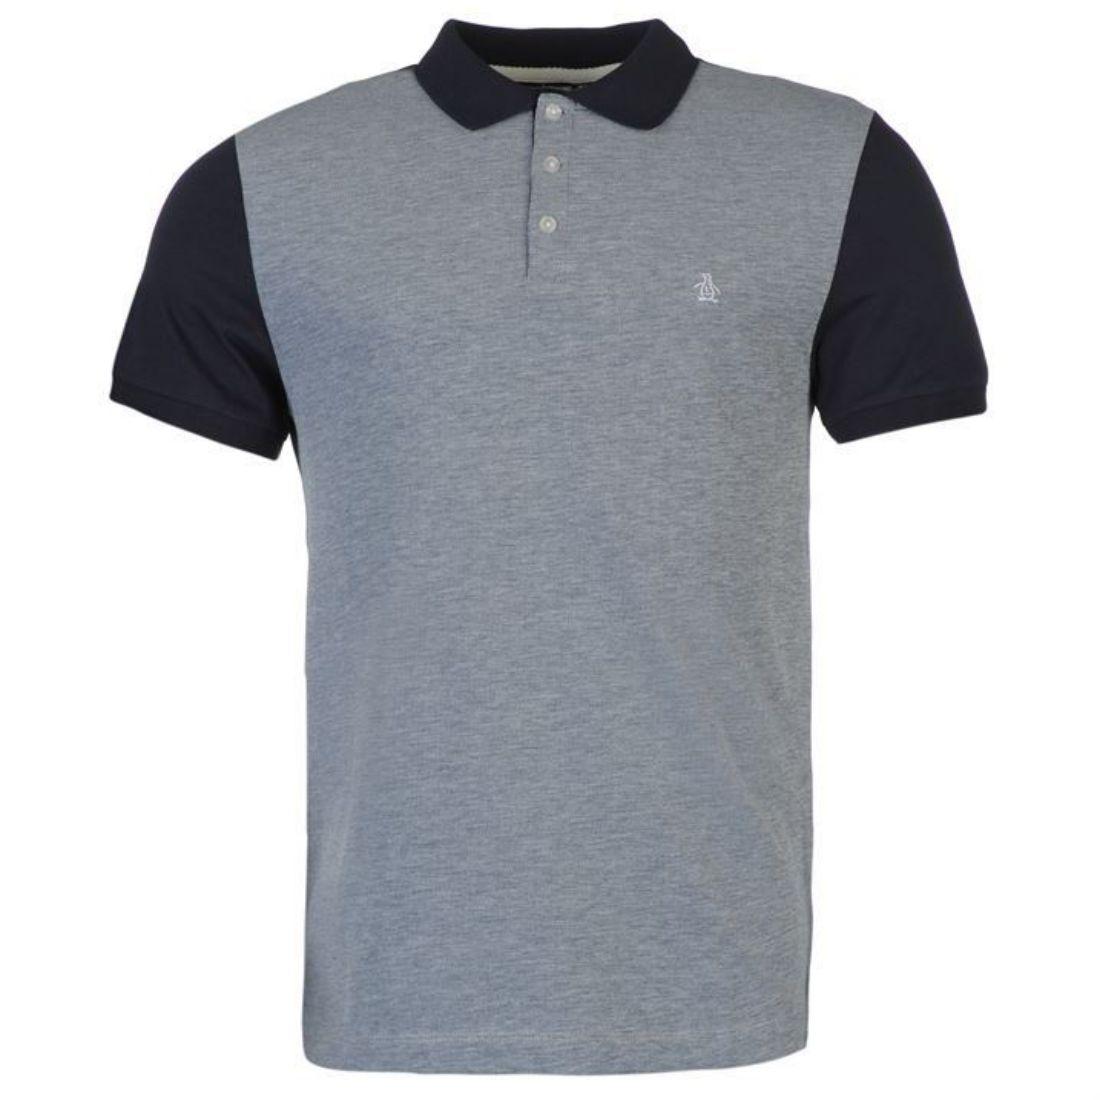 0cadc5208044 Penguin Mens Dimmer Polo Shirt Lightweight Casual Short Sleeve ...